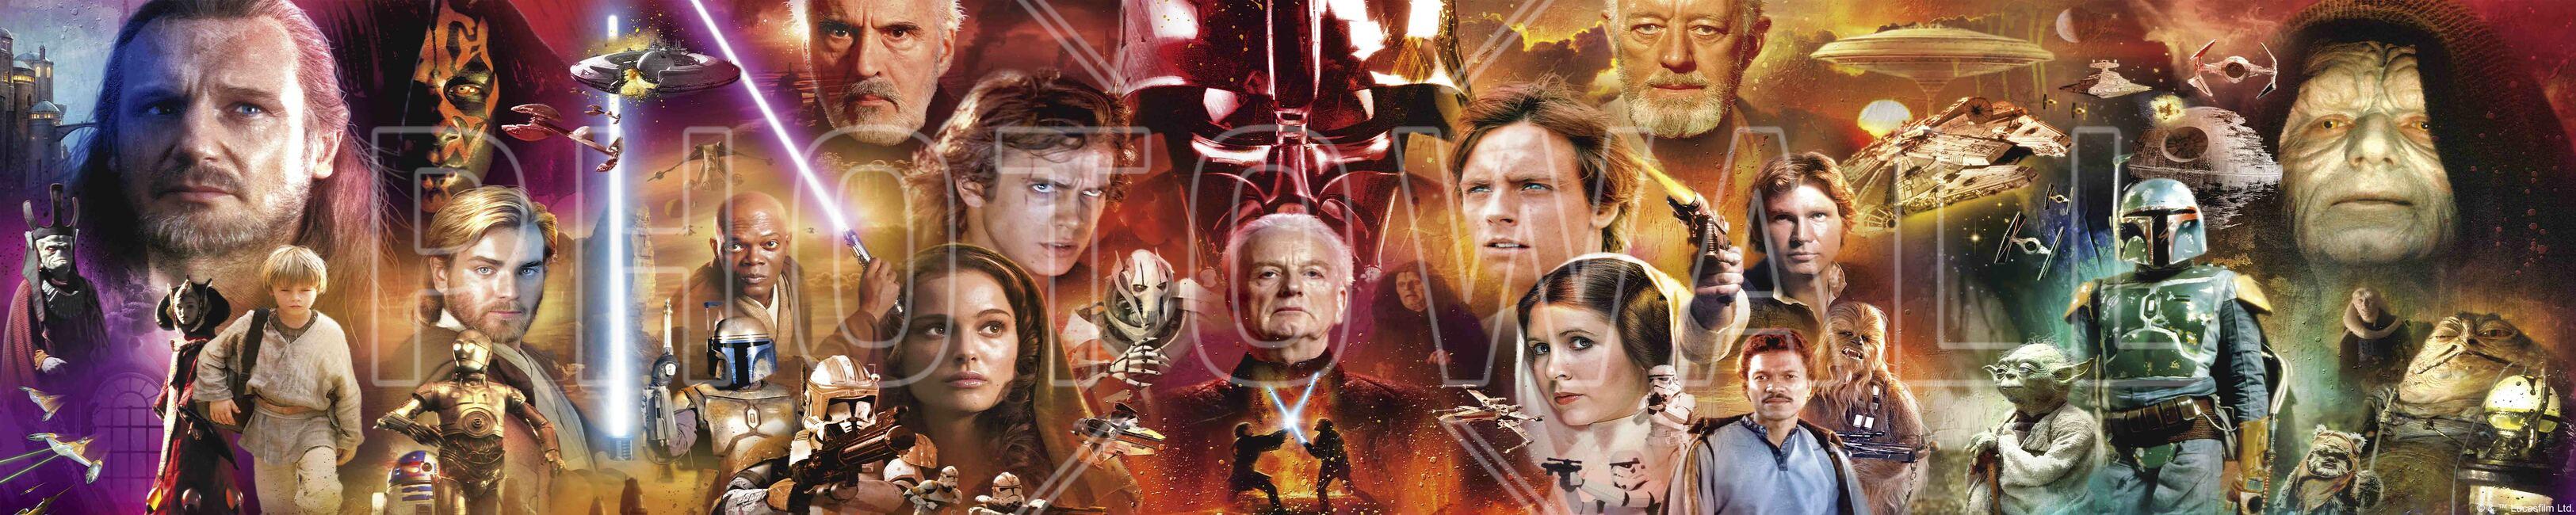 Star Wars - Collage Fototapeter & Tapeter 100 x 100 cm